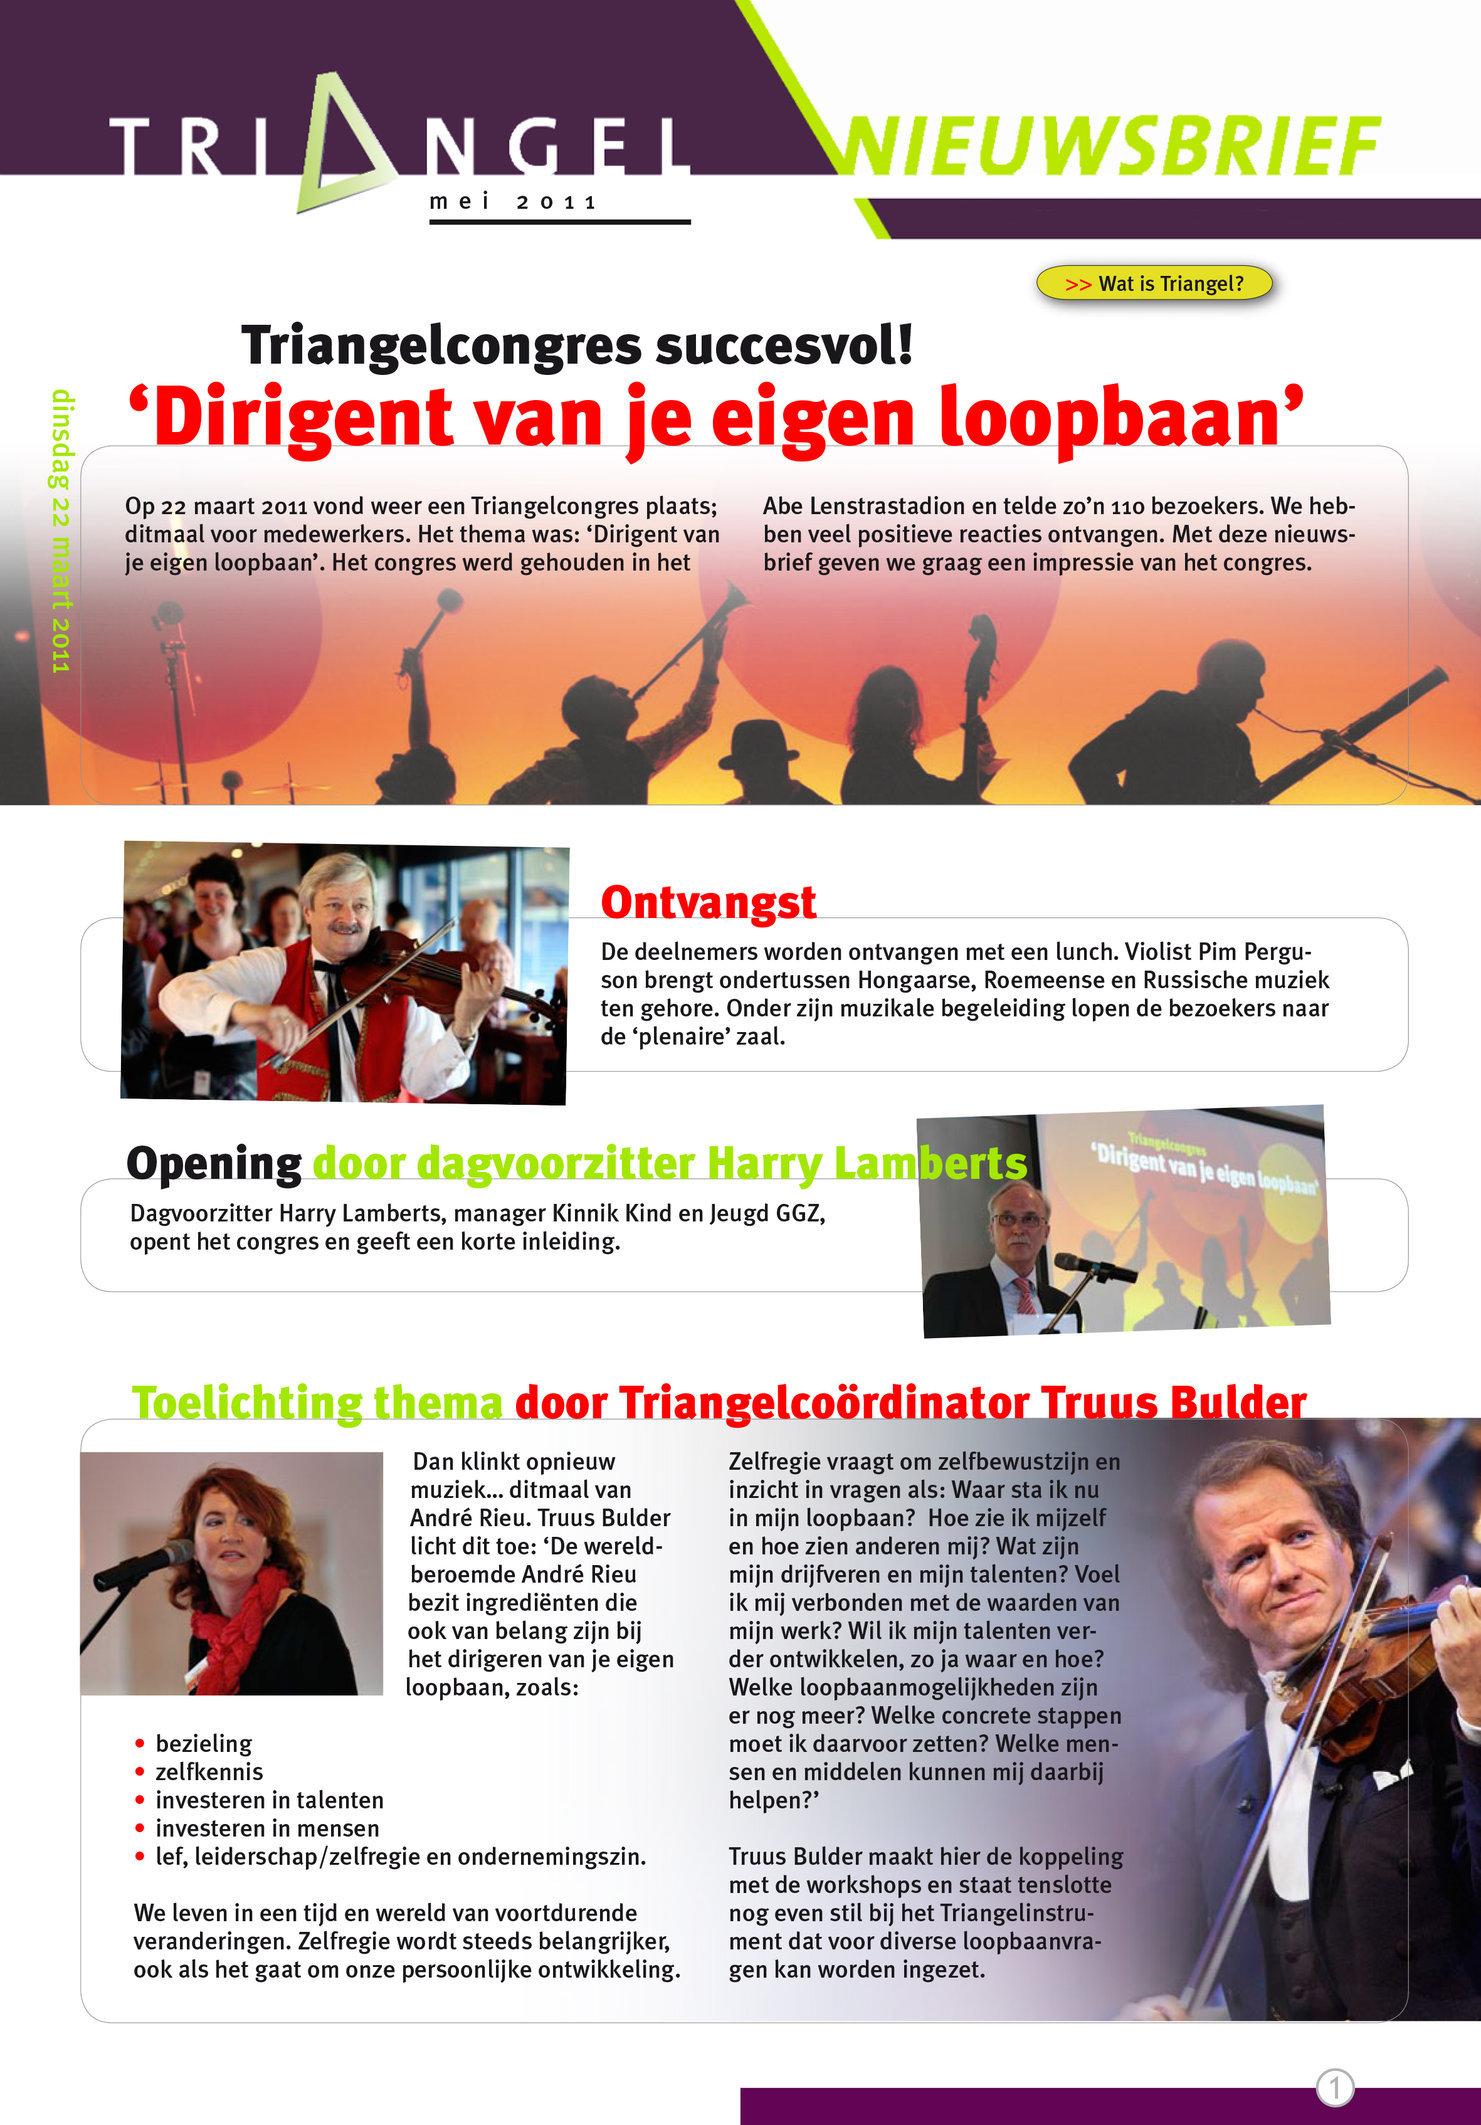 Triangel Nieuwsbrief 2011